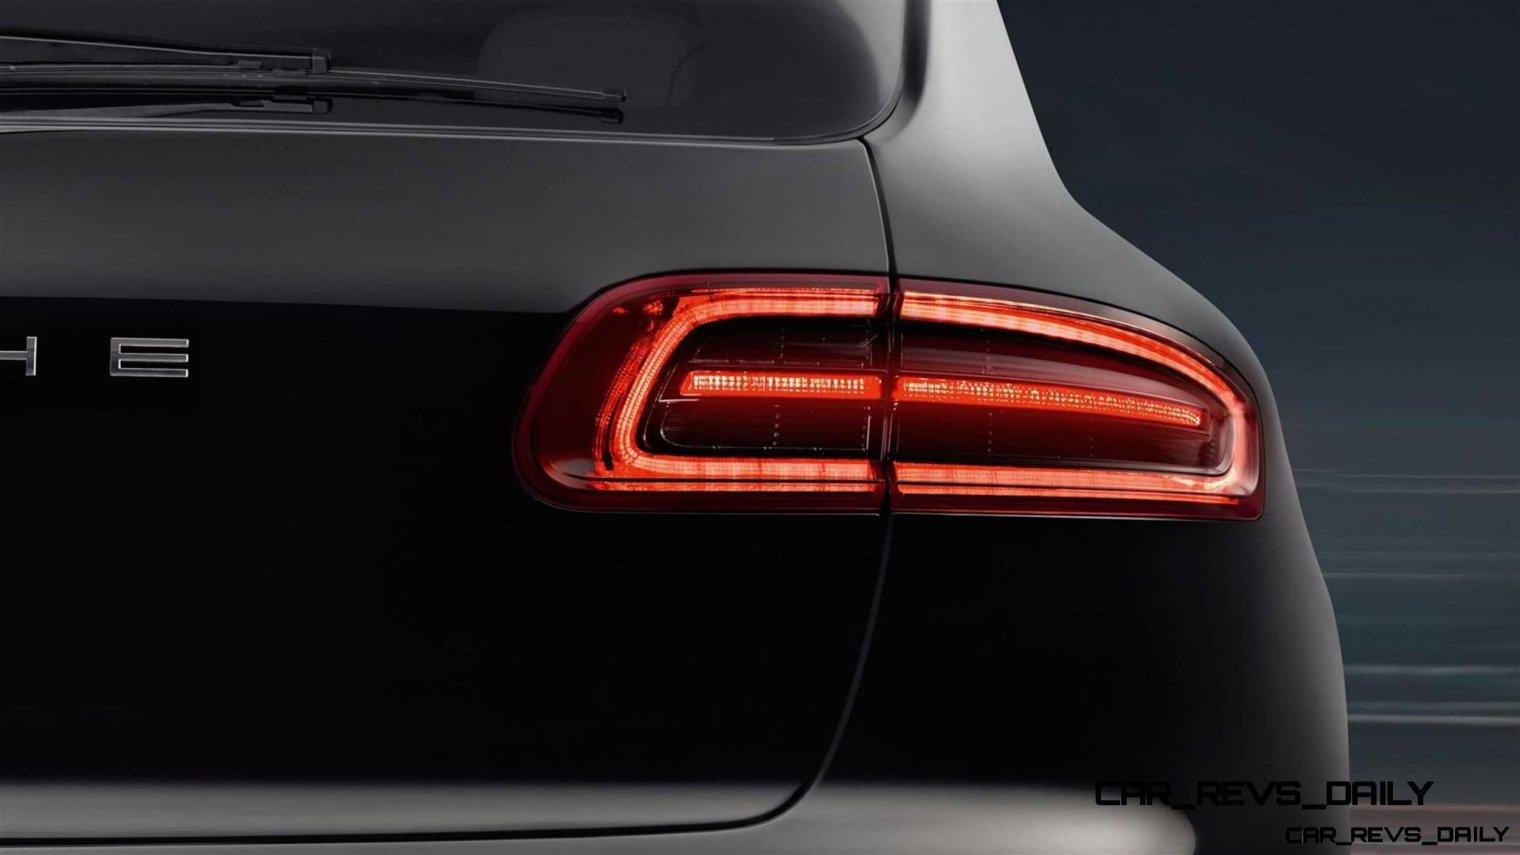 2015 Porsche Macan - Latest Images - CarRevsDaily.com 14